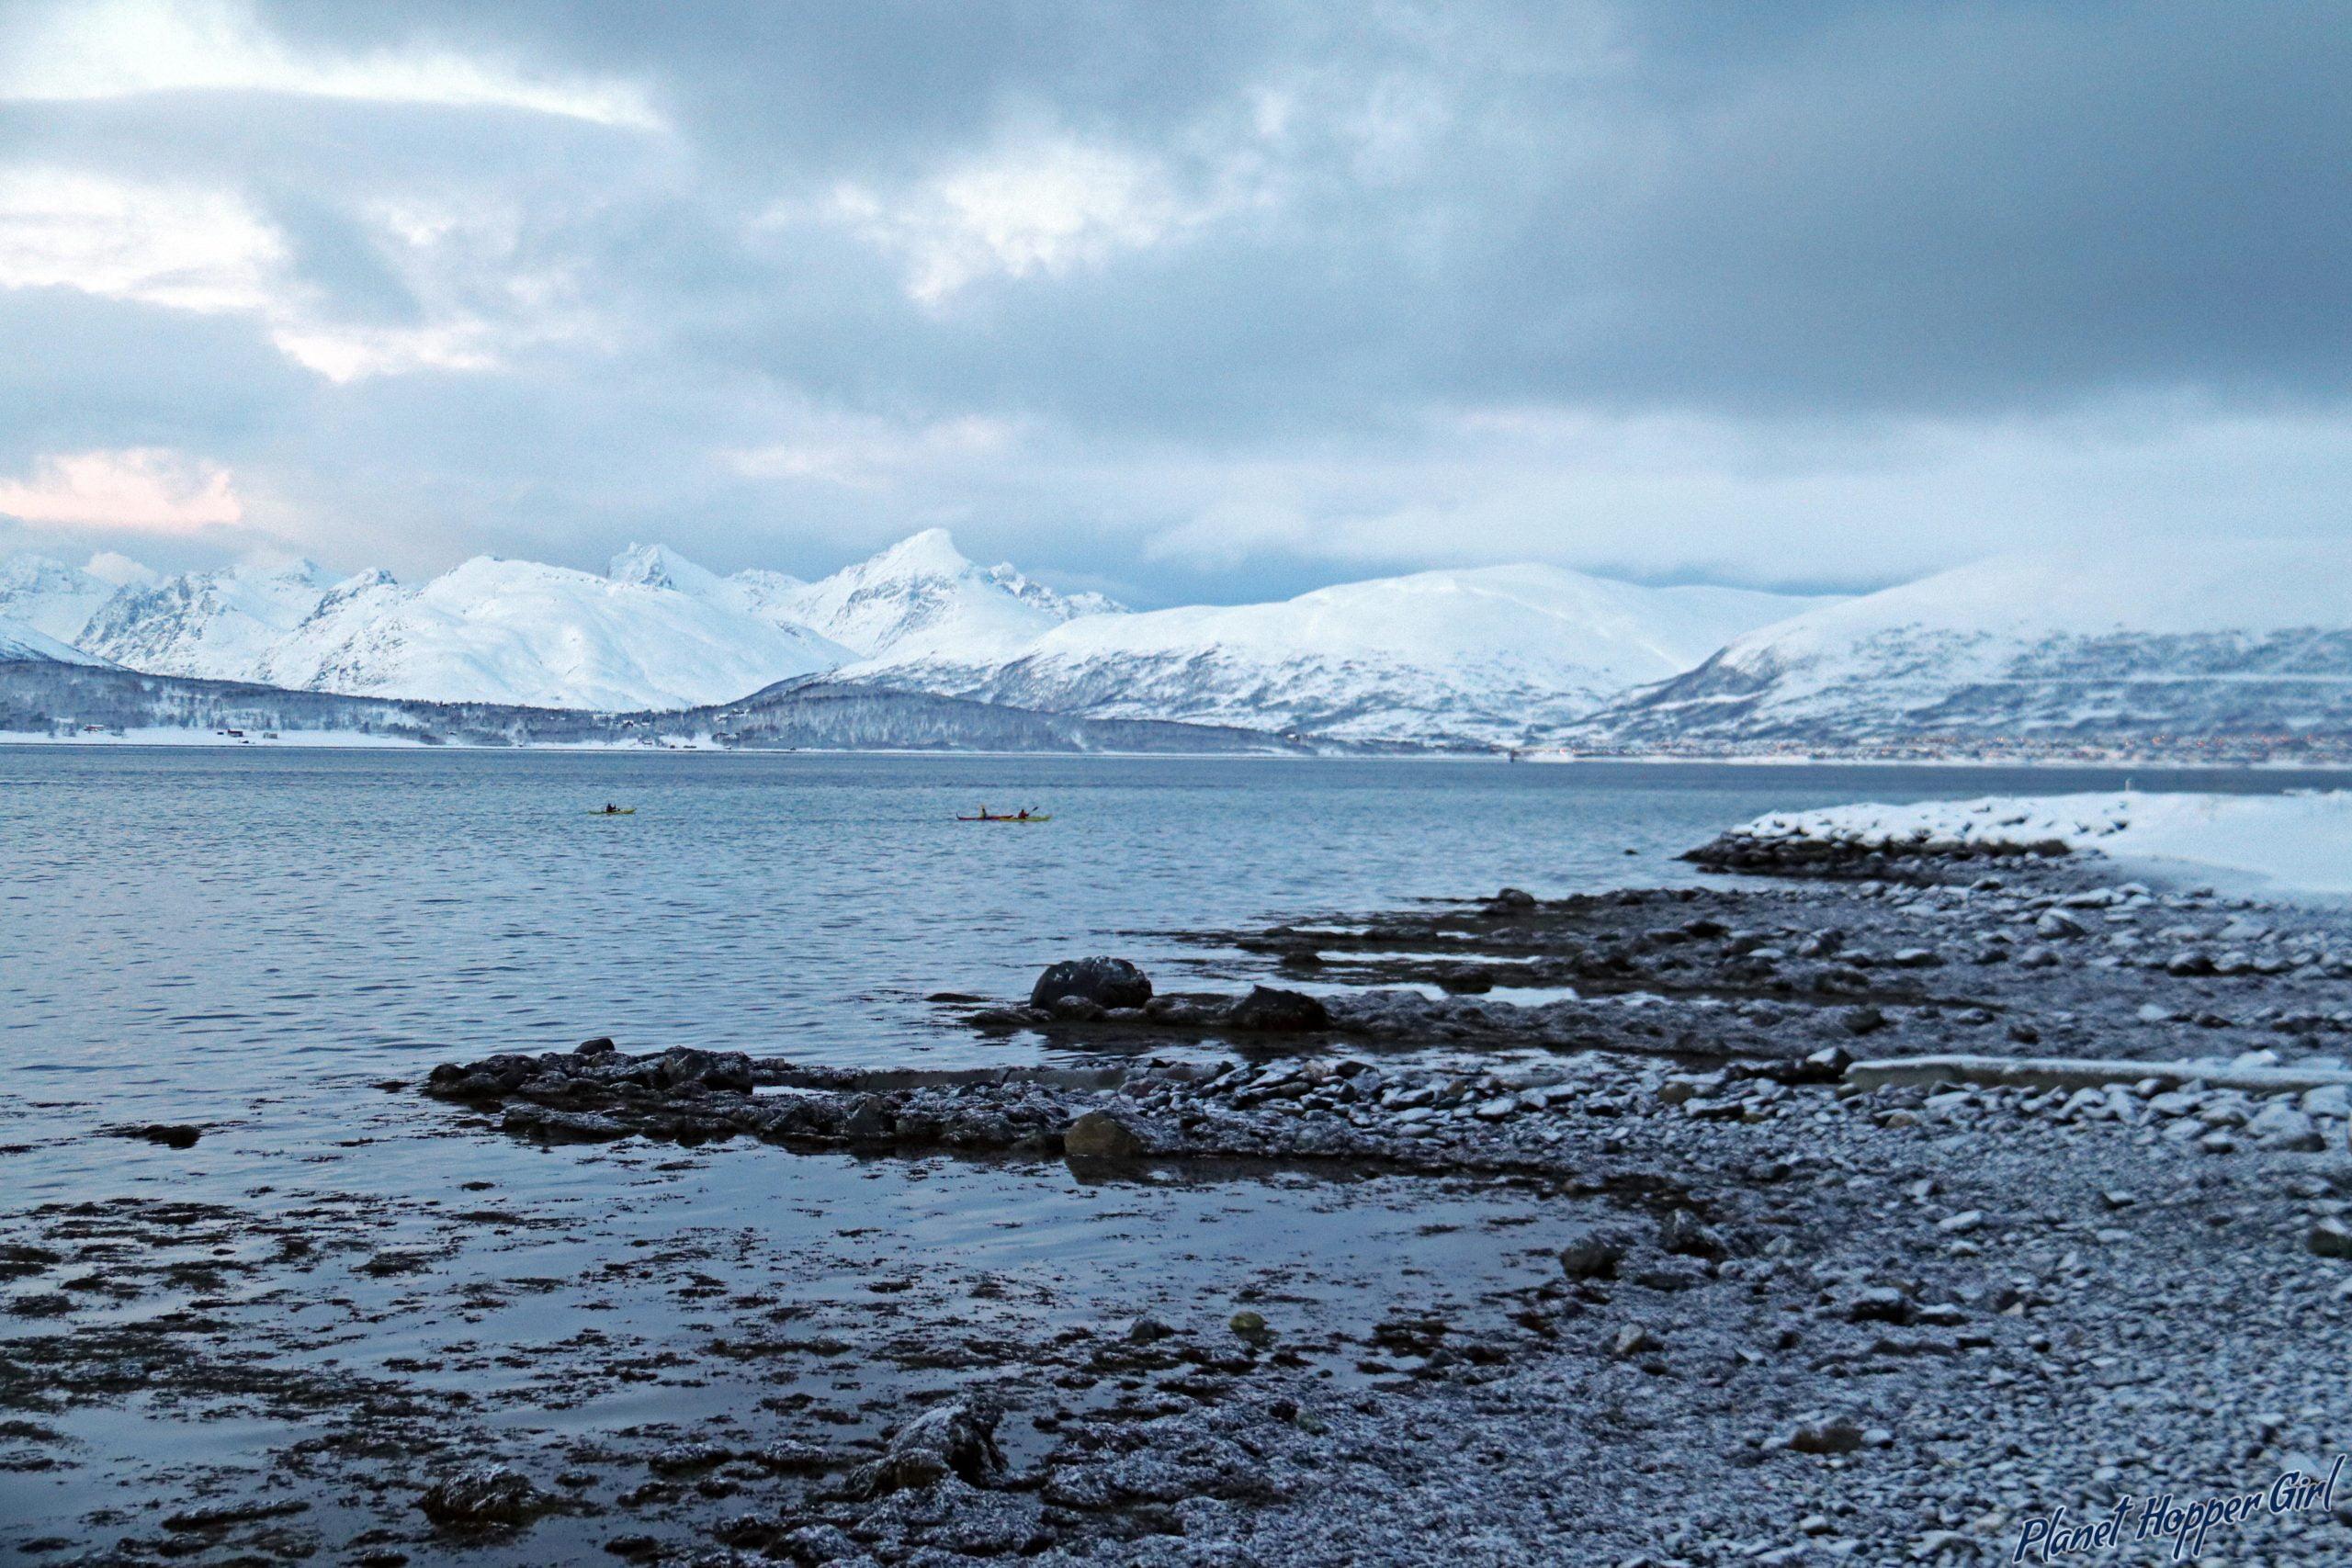 The Norwegian snow landscape in Tromso, Norway